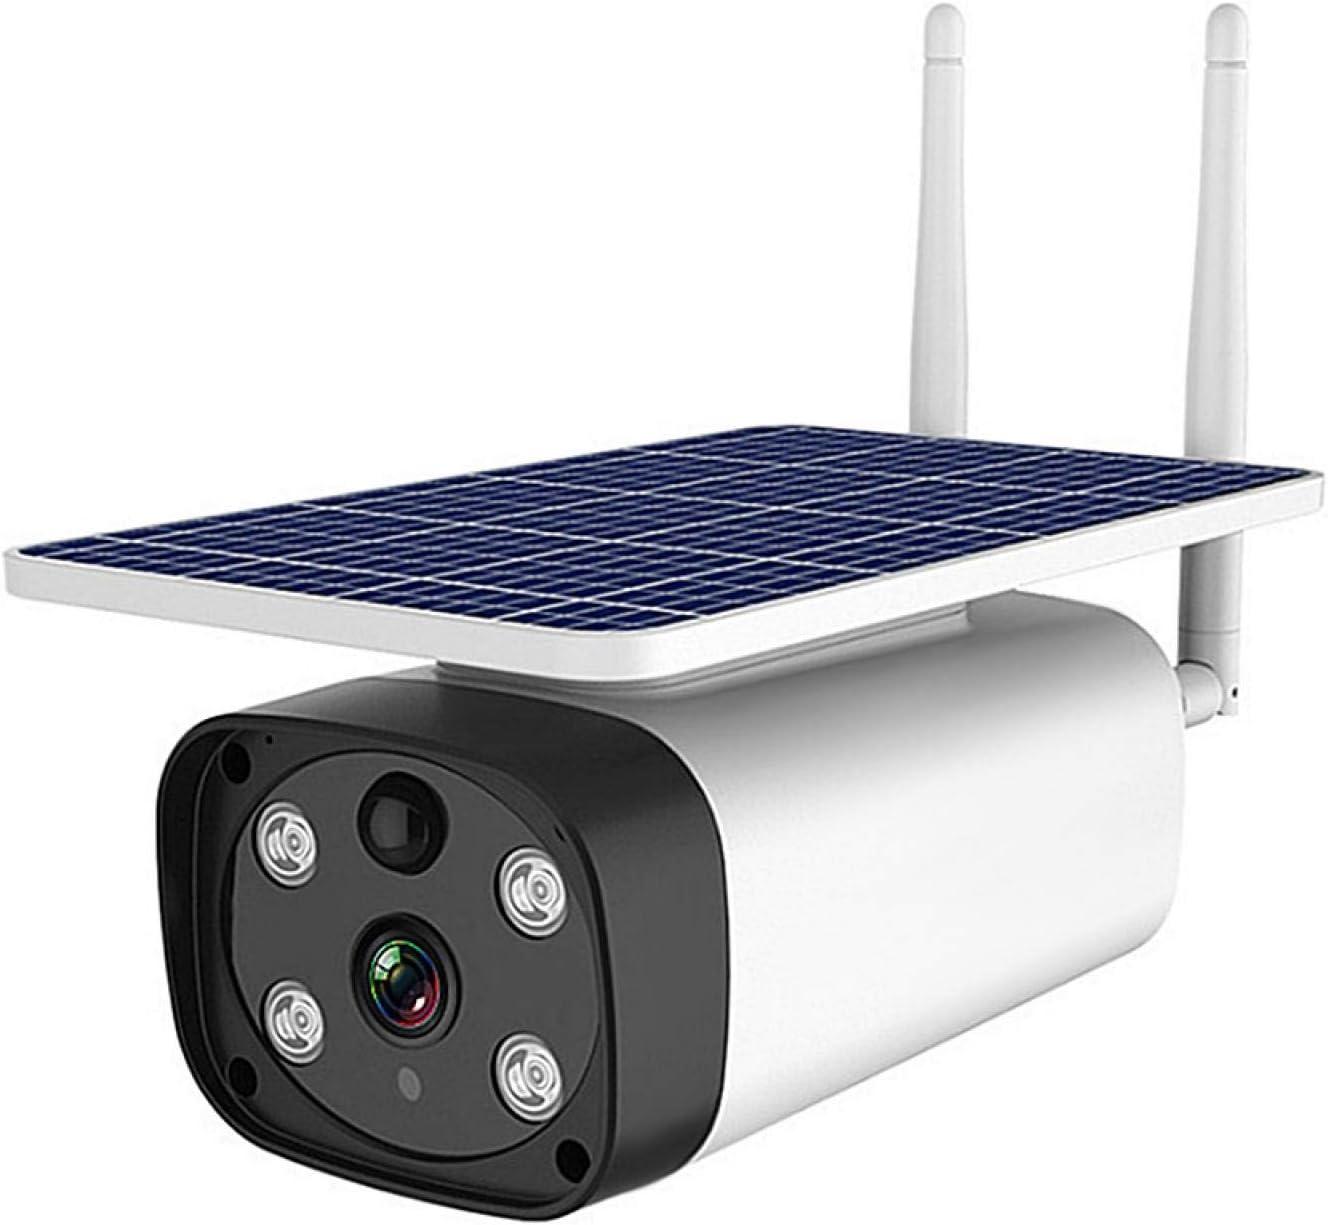 Pwshymi Excellent Starlight Discount is also underway Outdoor Camera Night IP67 5W Vision Waterproof